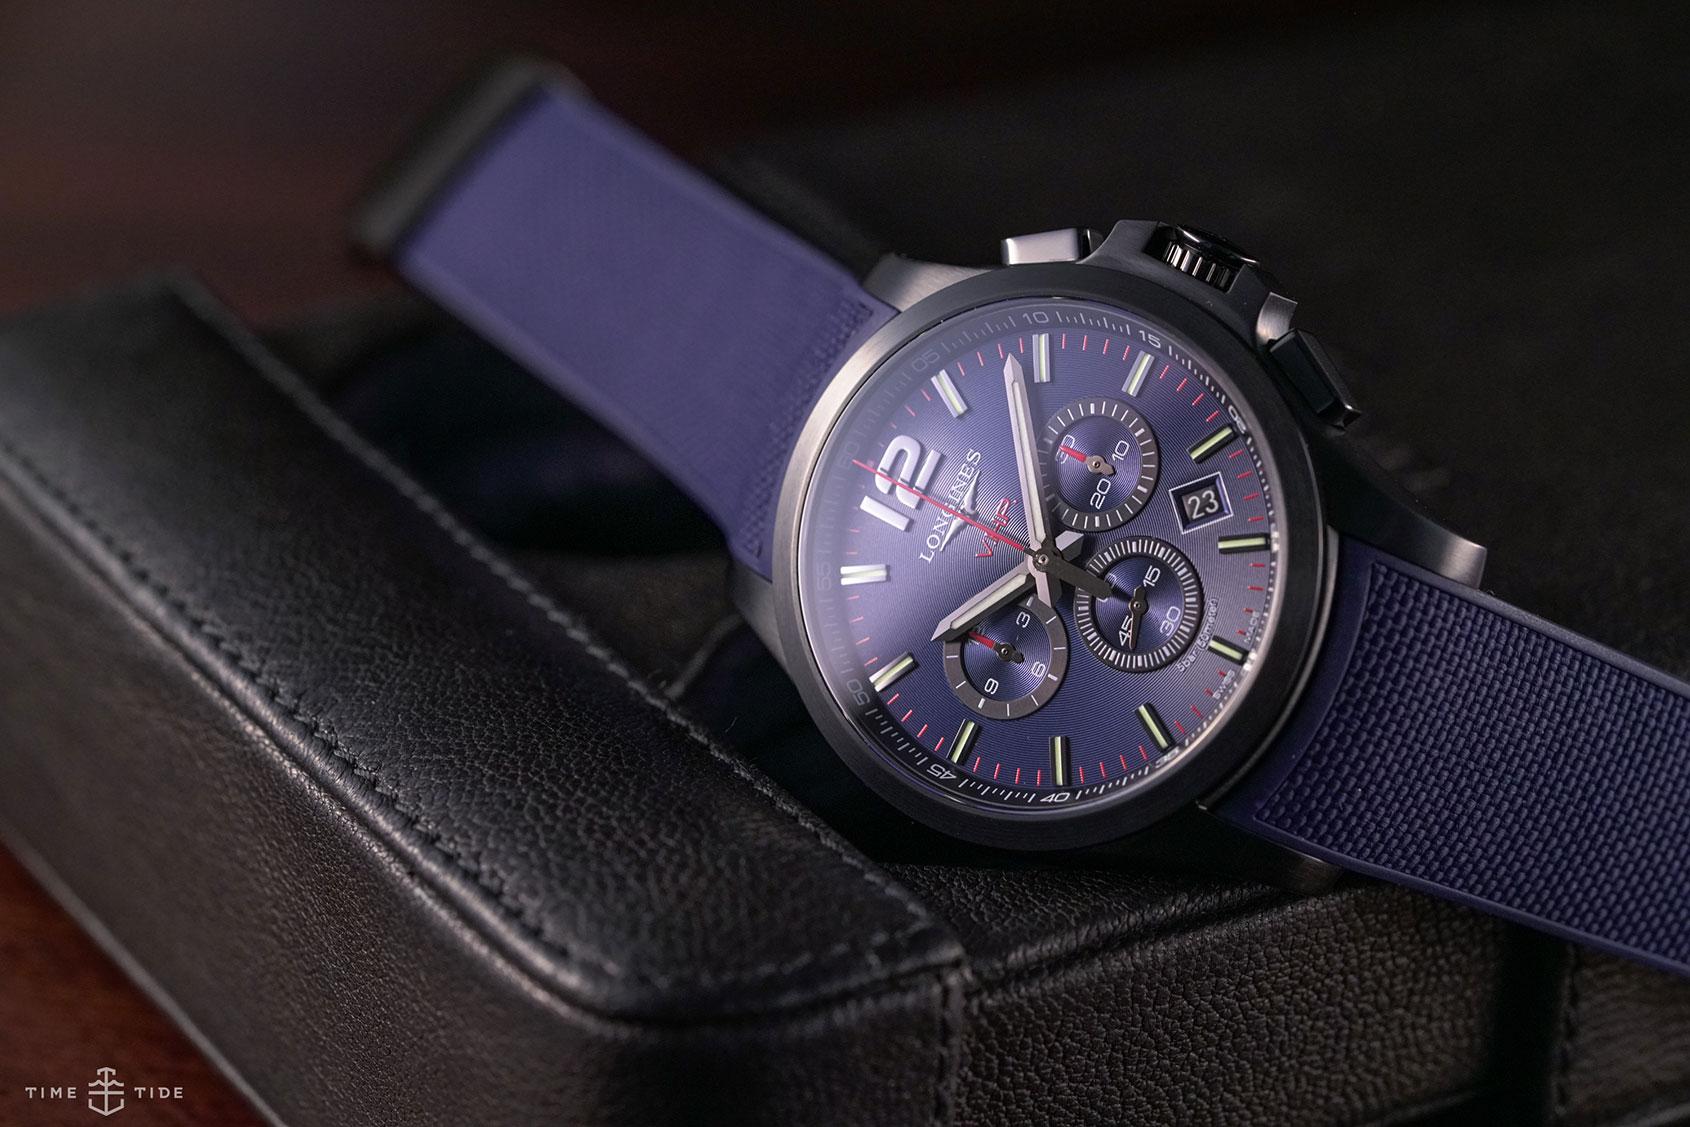 10 great chronographs under $10K